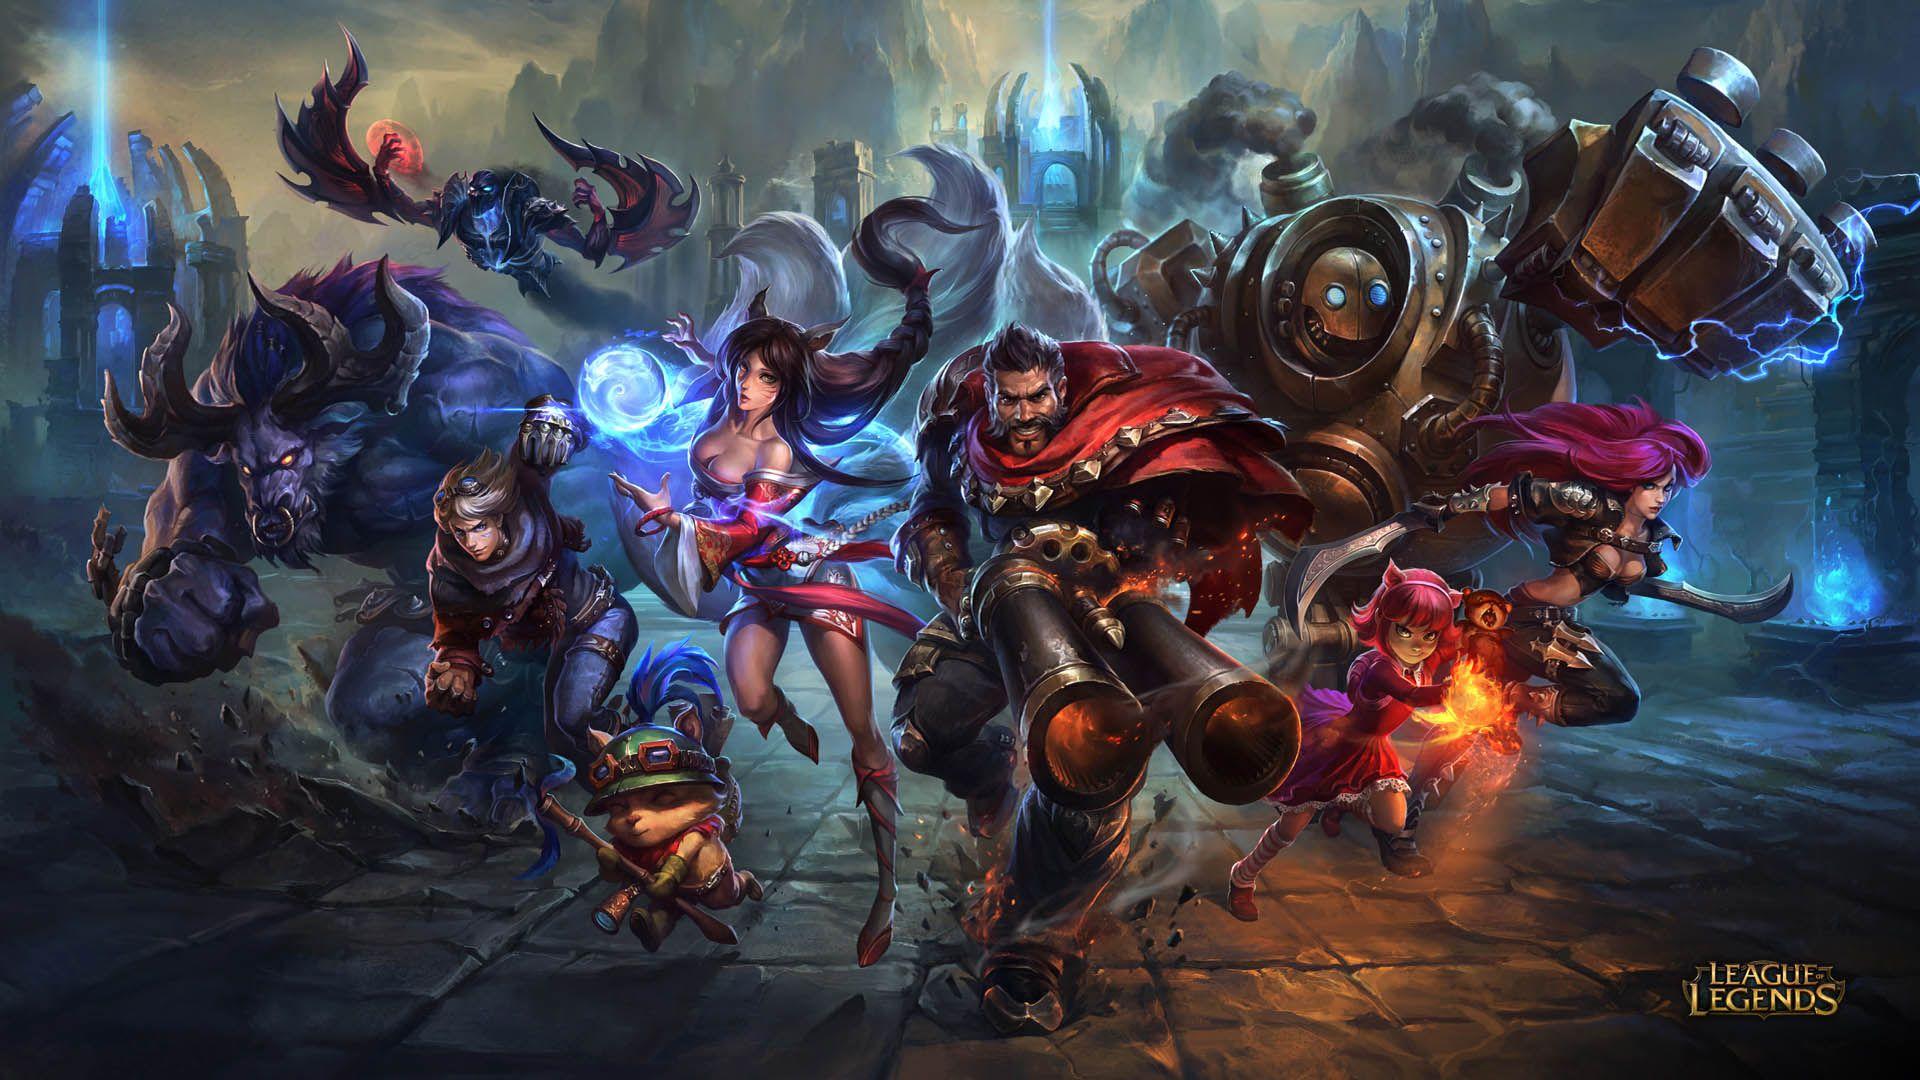 League Of Legends Team Hd Wallpaper Download Wallpaper From Wallpapershade Com League Of Legends League Of Legends Game Play League Of Legends